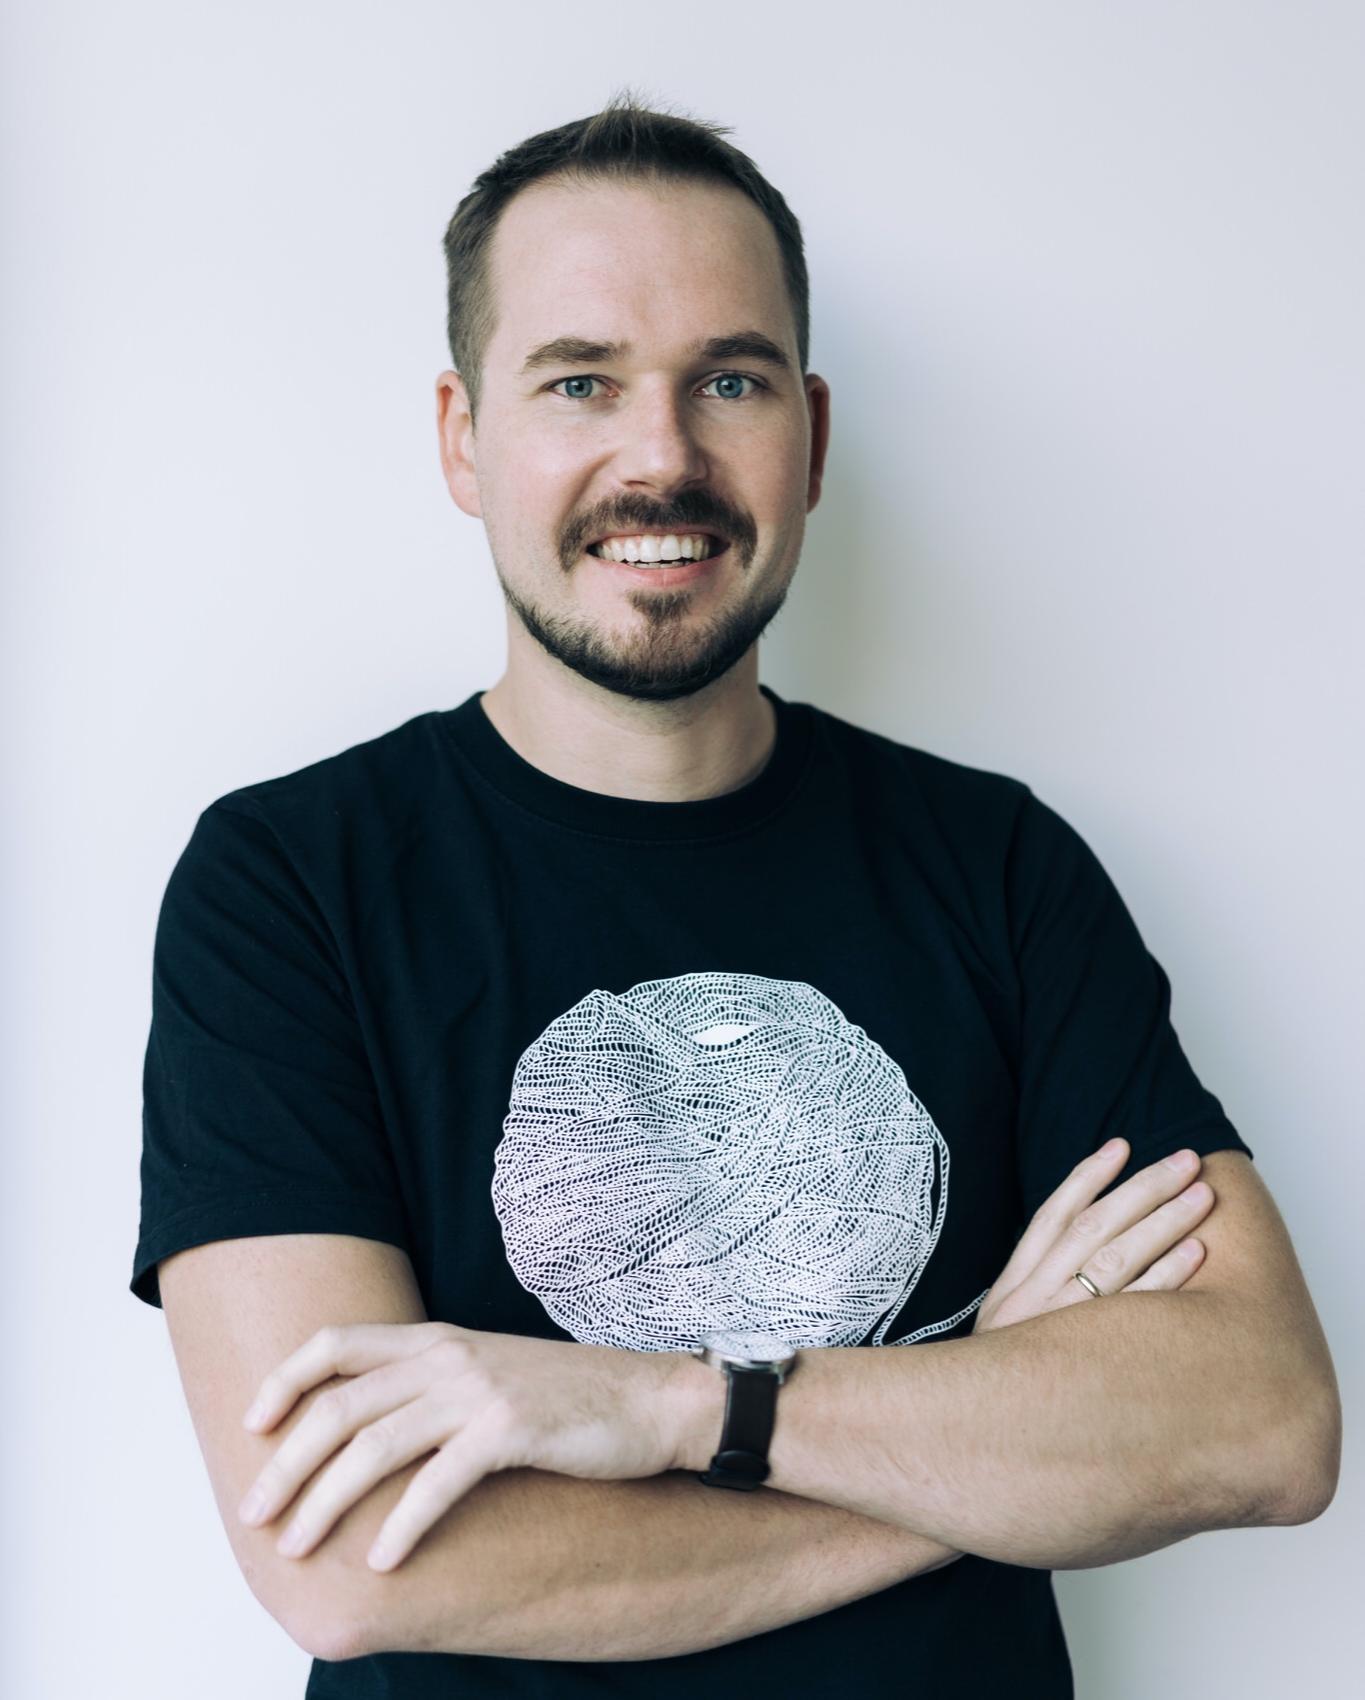 Tautvilas Hacker Noon profile picture